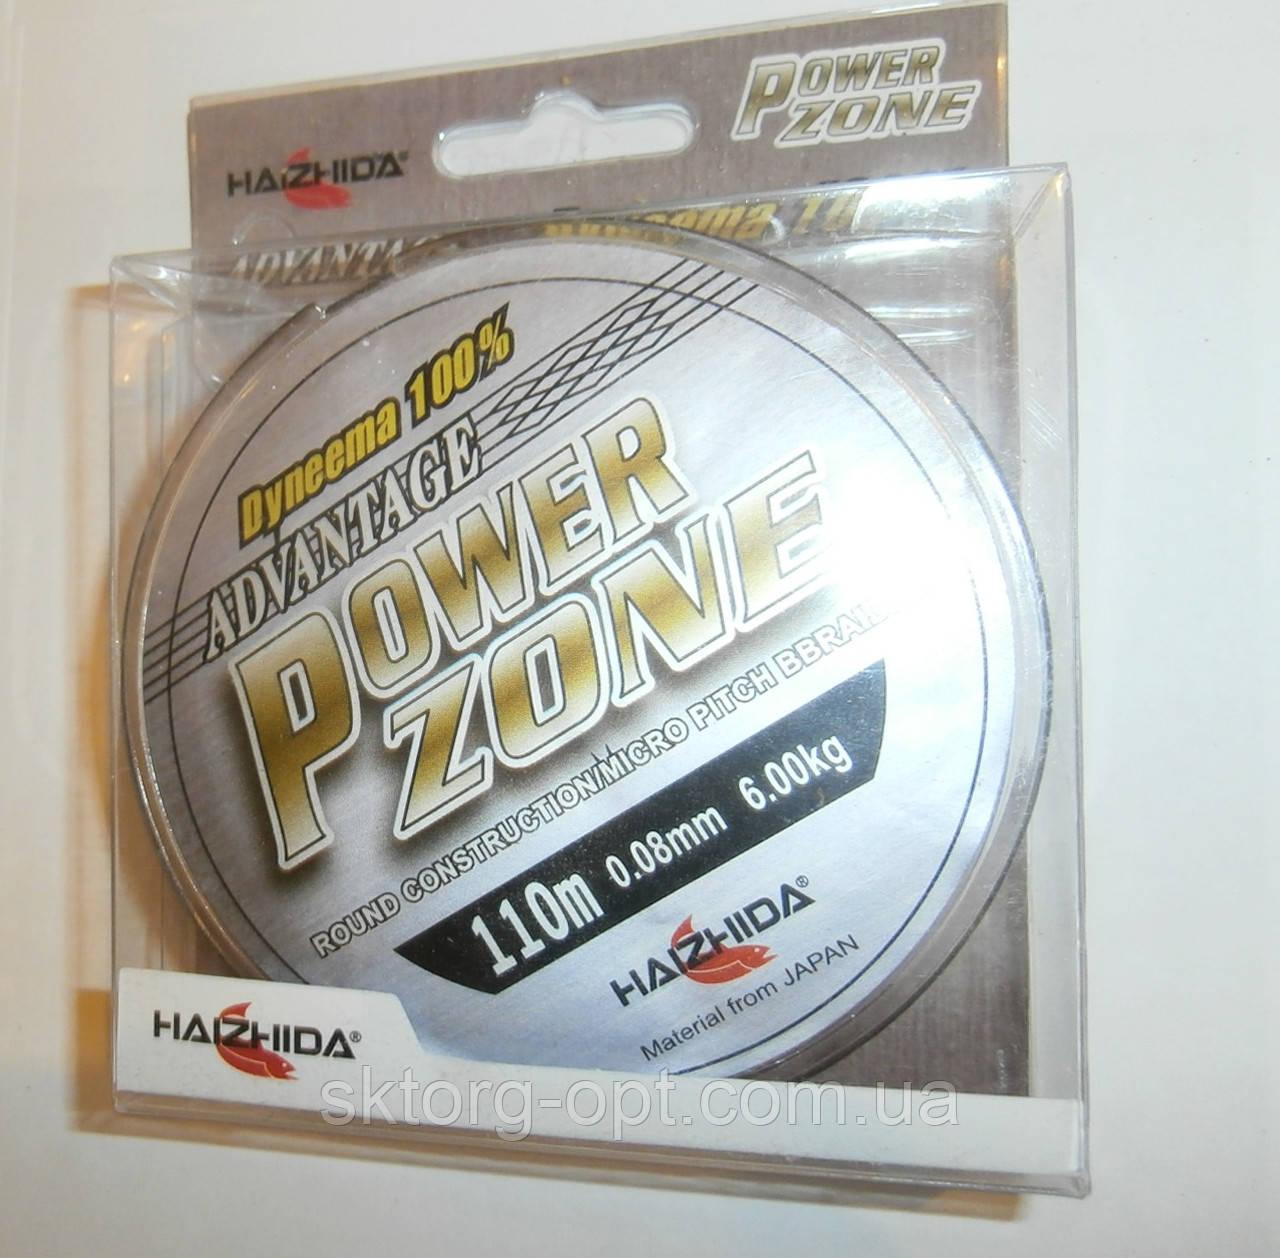 Шнур Haizhida Avantage Power Zone 110m 0,08 Dyneema 100%